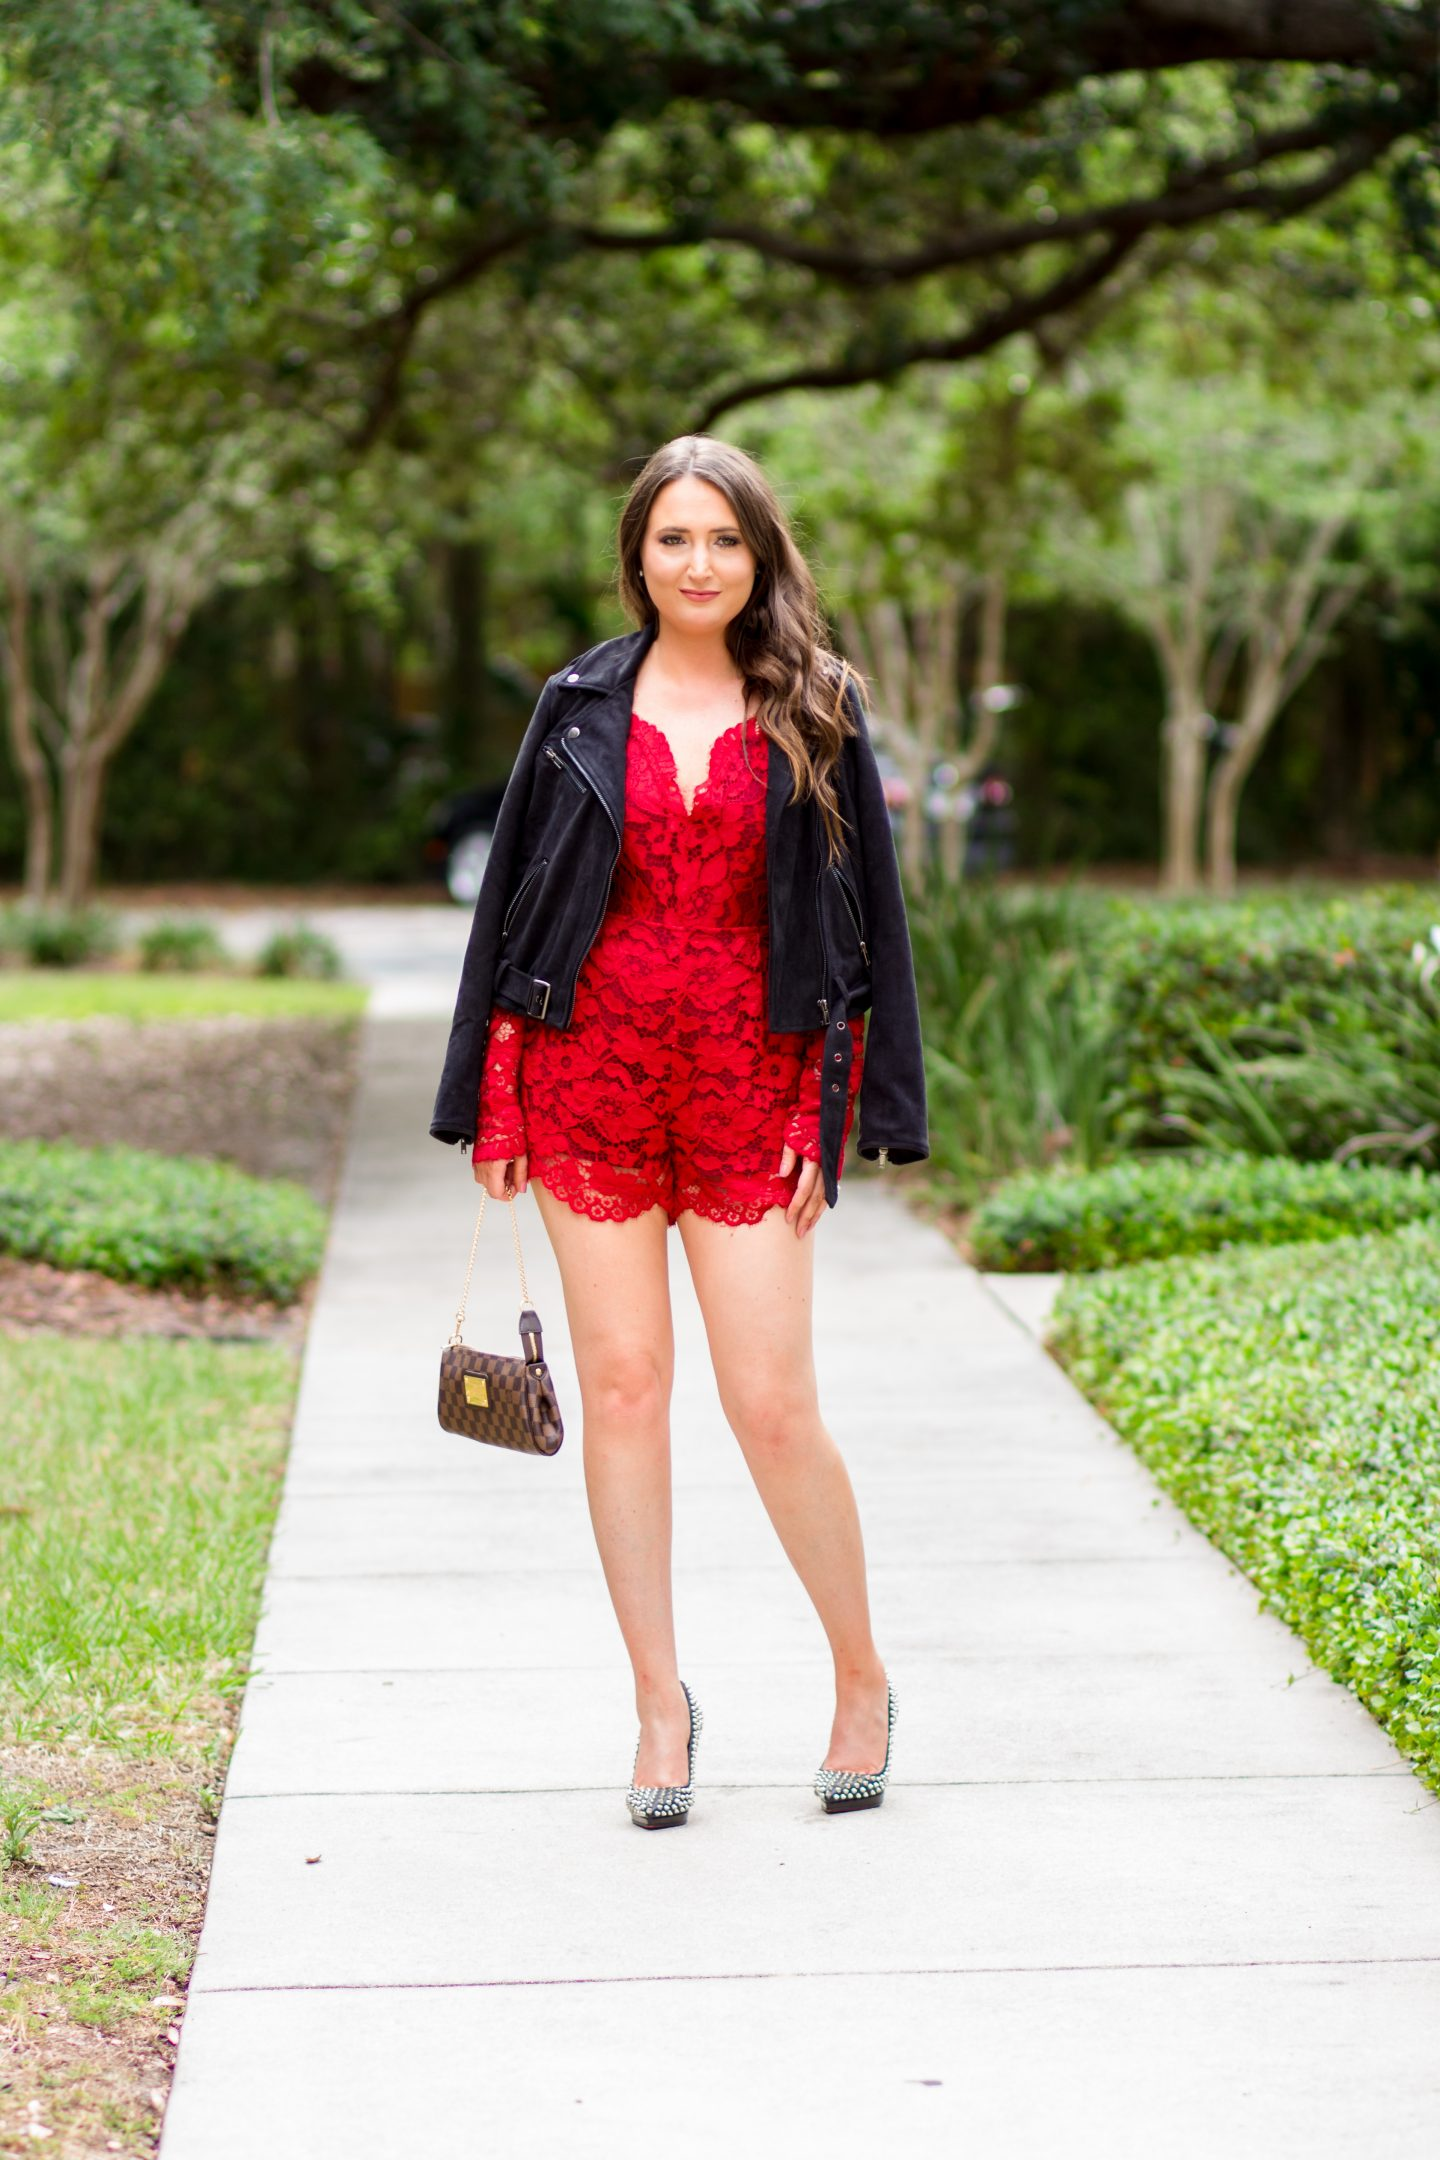 red lace romper, black suede jacket, louboutin spiked heels, louis vuitton eva clutch, lovers + friends, astr jacket